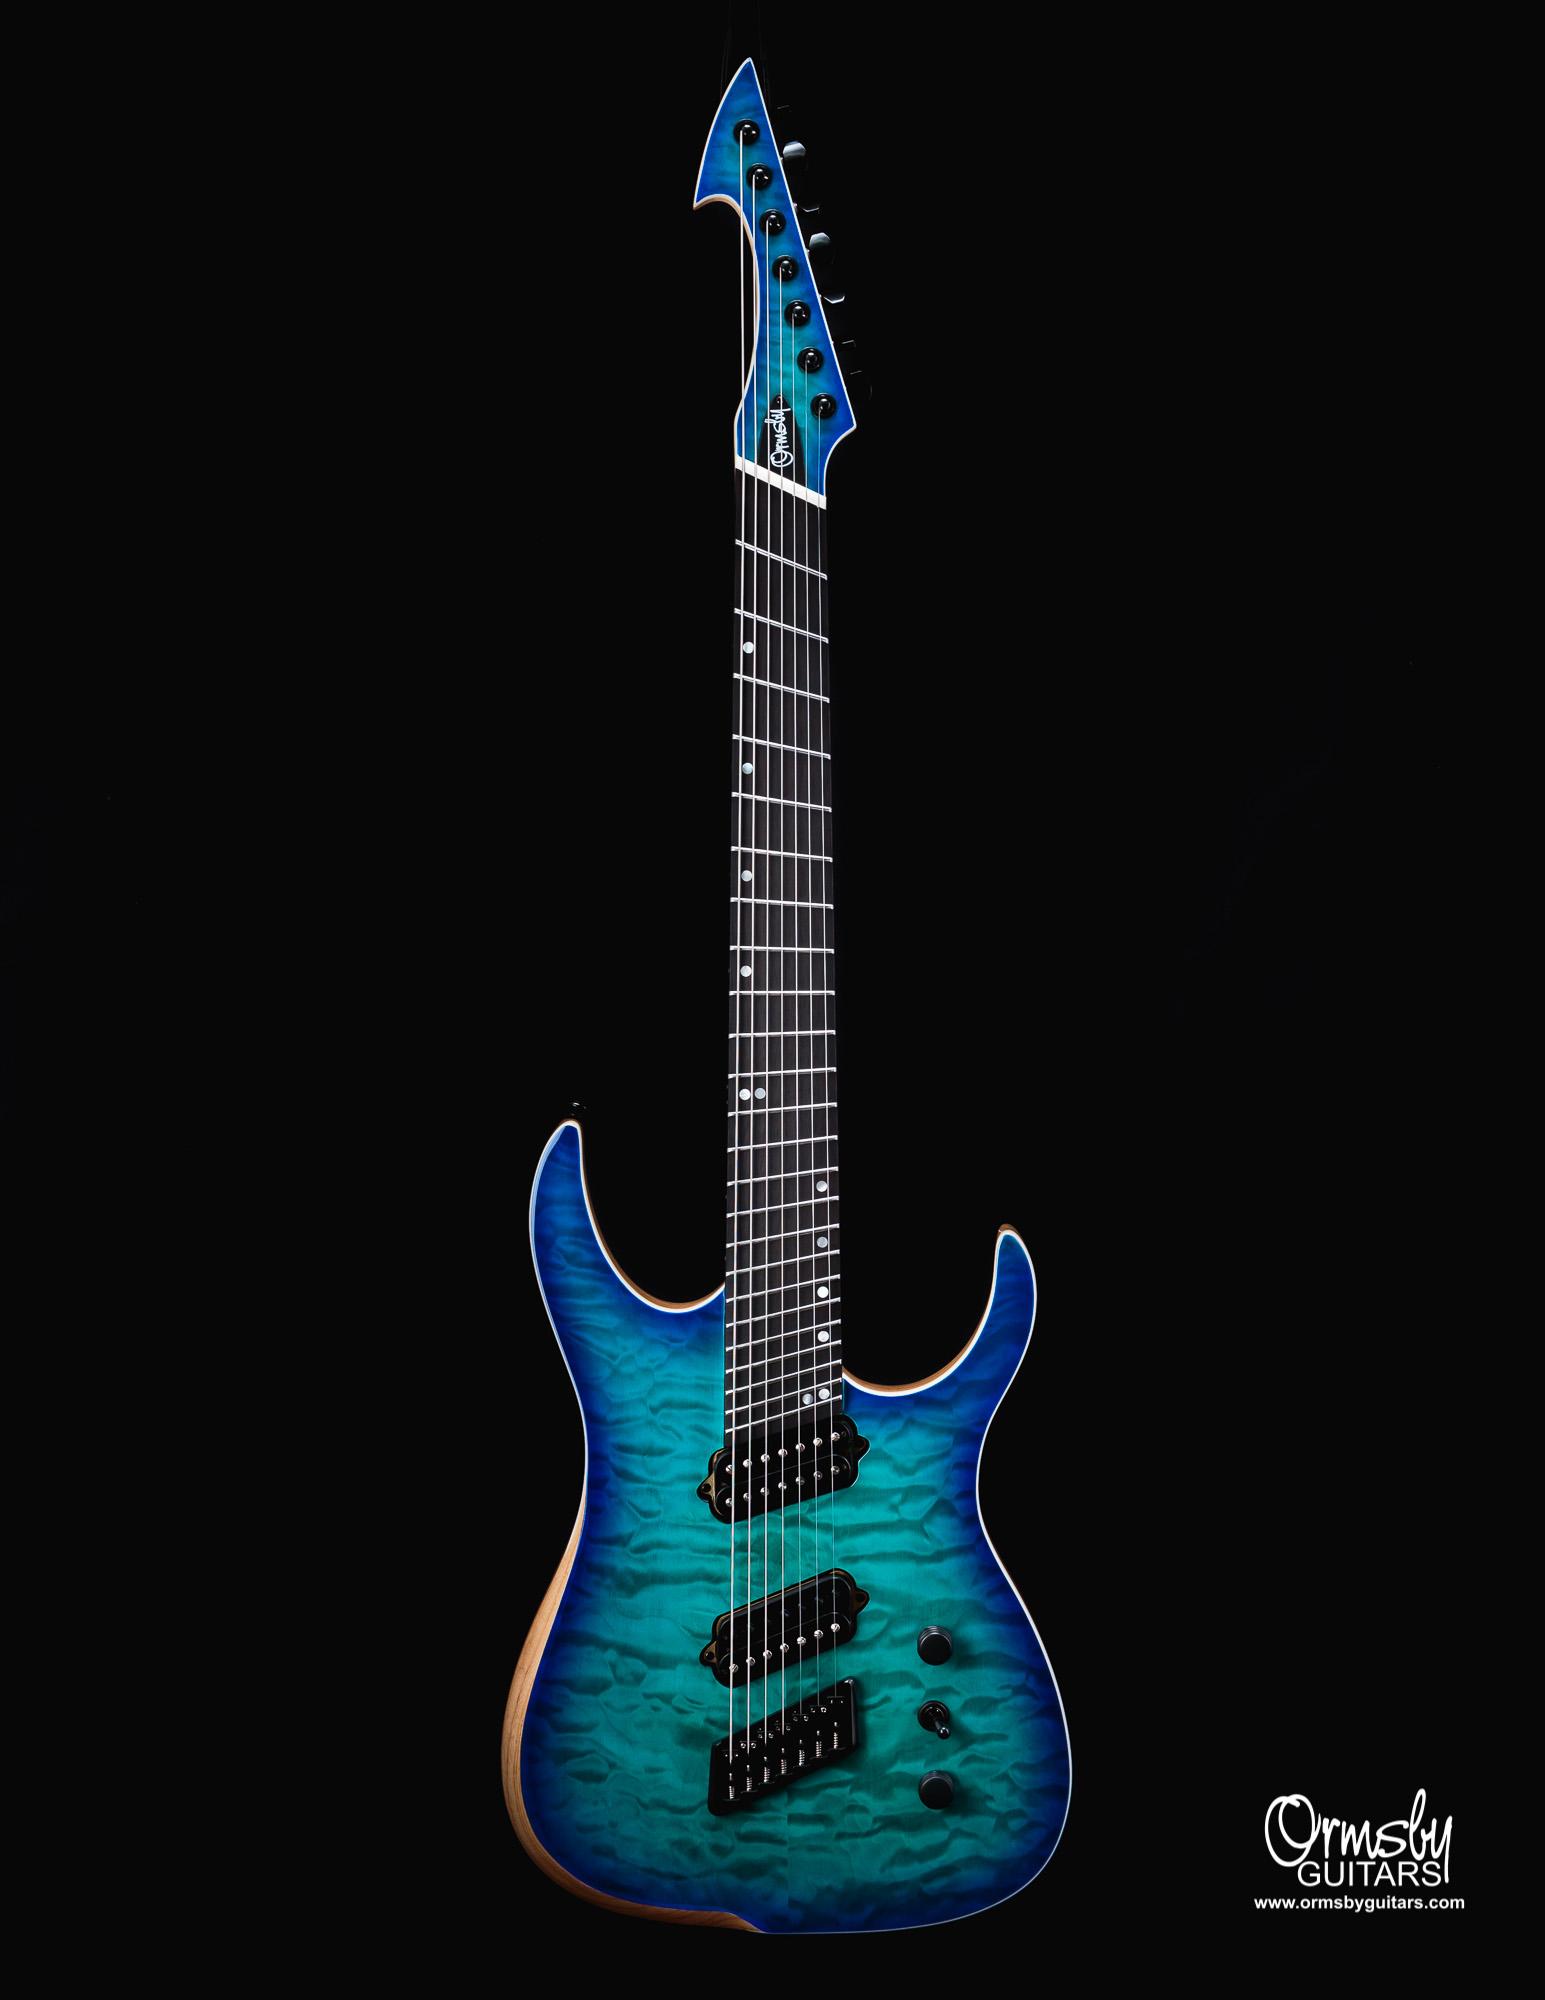 Ormsby Guitars GTR Hype Run11